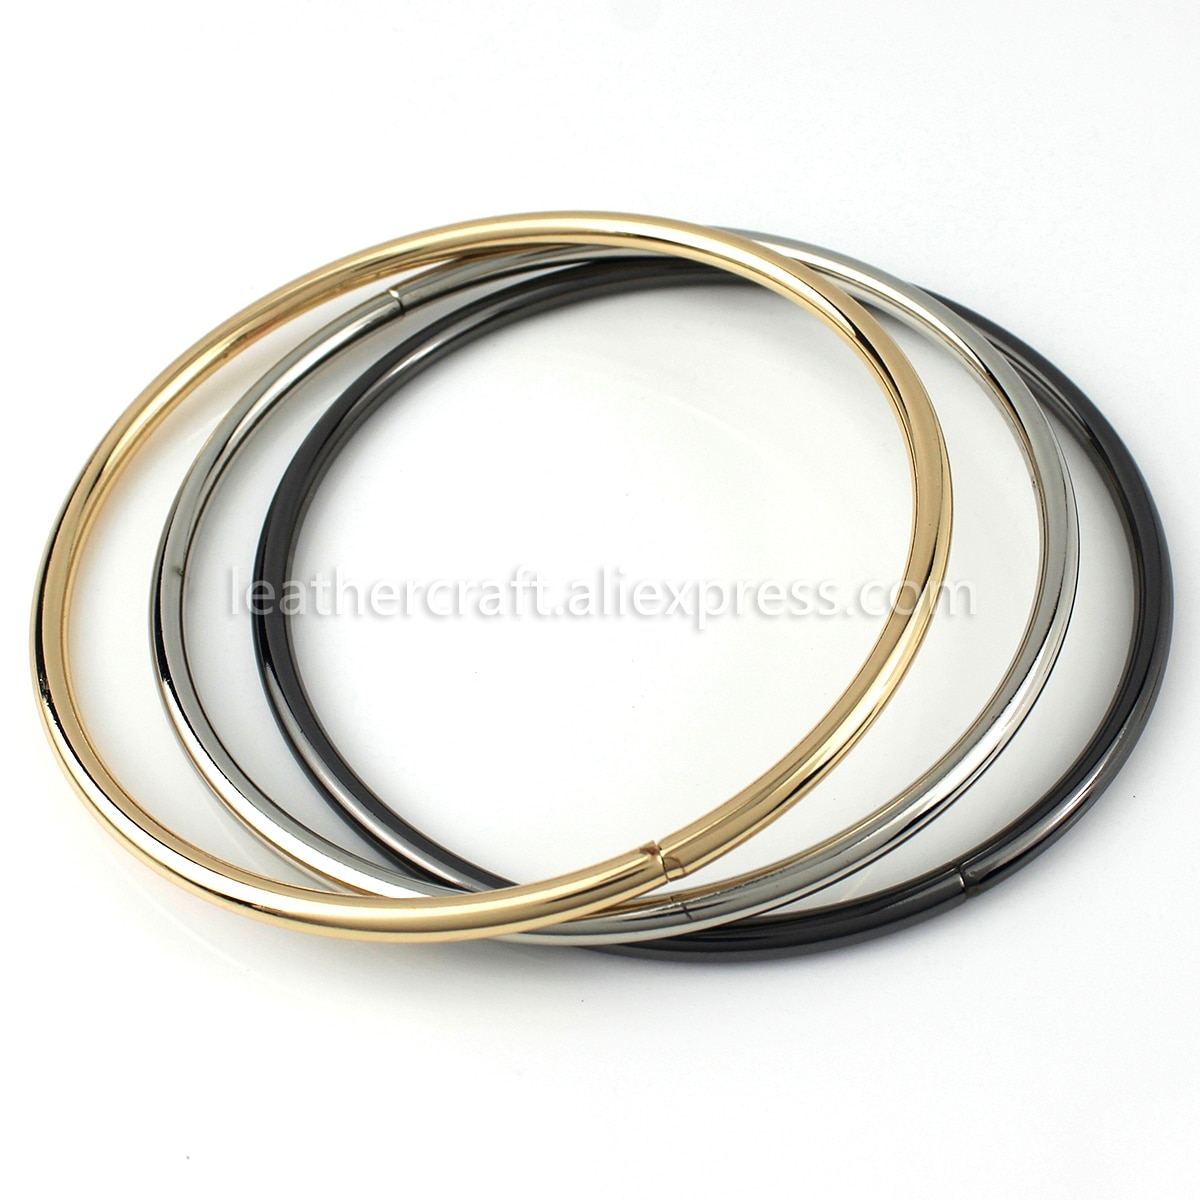 "1x bolsa de Metal sólido o-ring con asa de Metal correa de reemplazo bolso de mano equipaje DIY accesorios de Hardware de moda 115mm(4-1/2 "")"